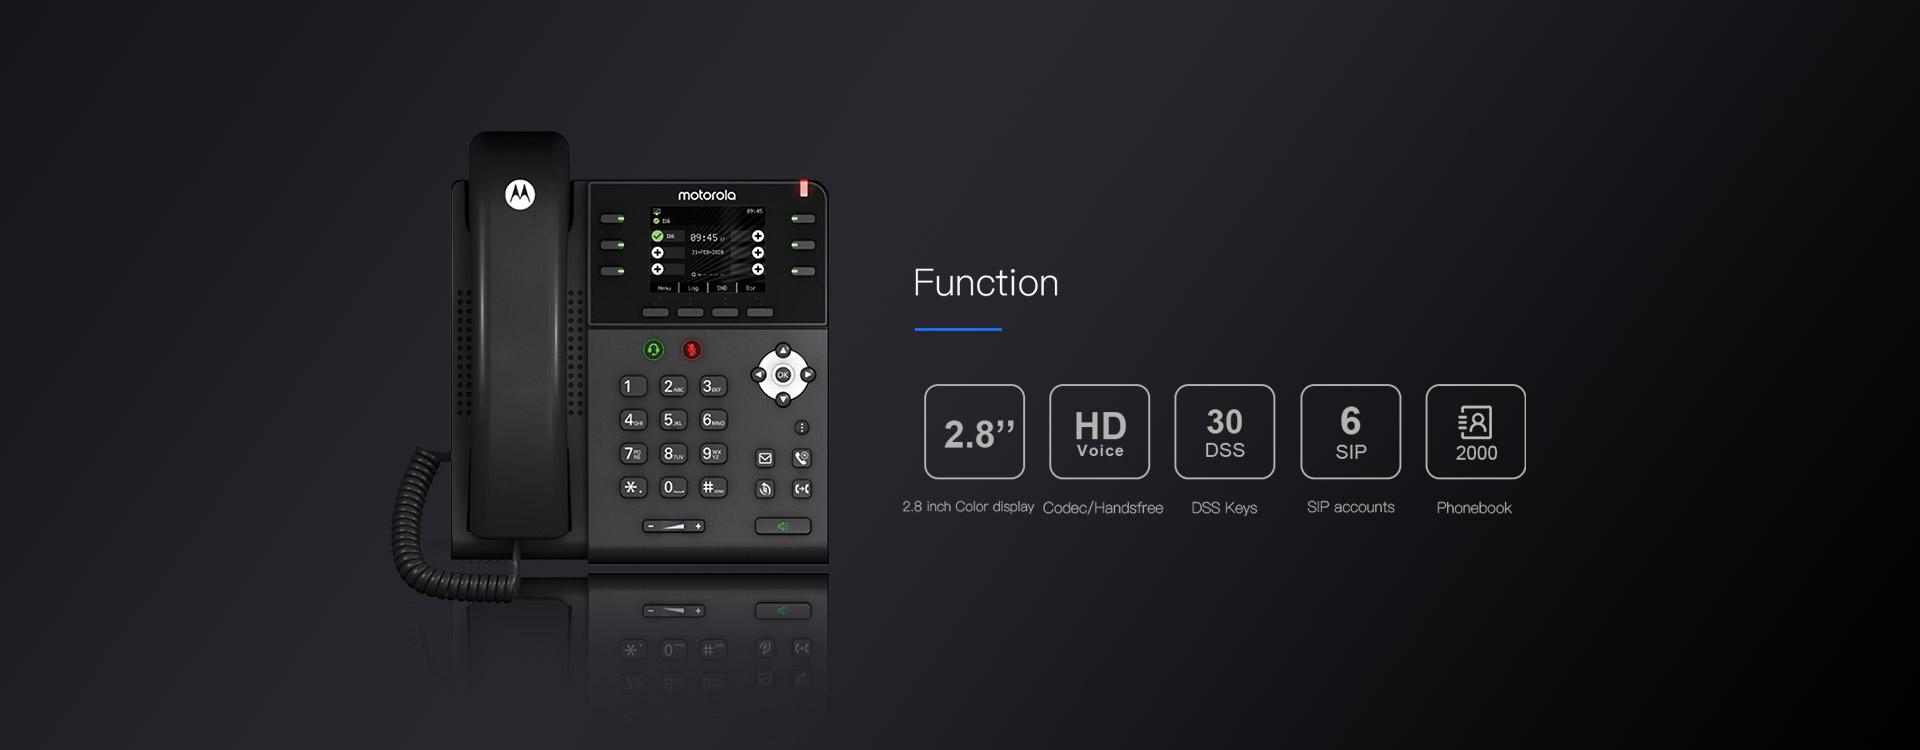 Motorola 300IP-6P Ofis Telefonu Fonksiyonları